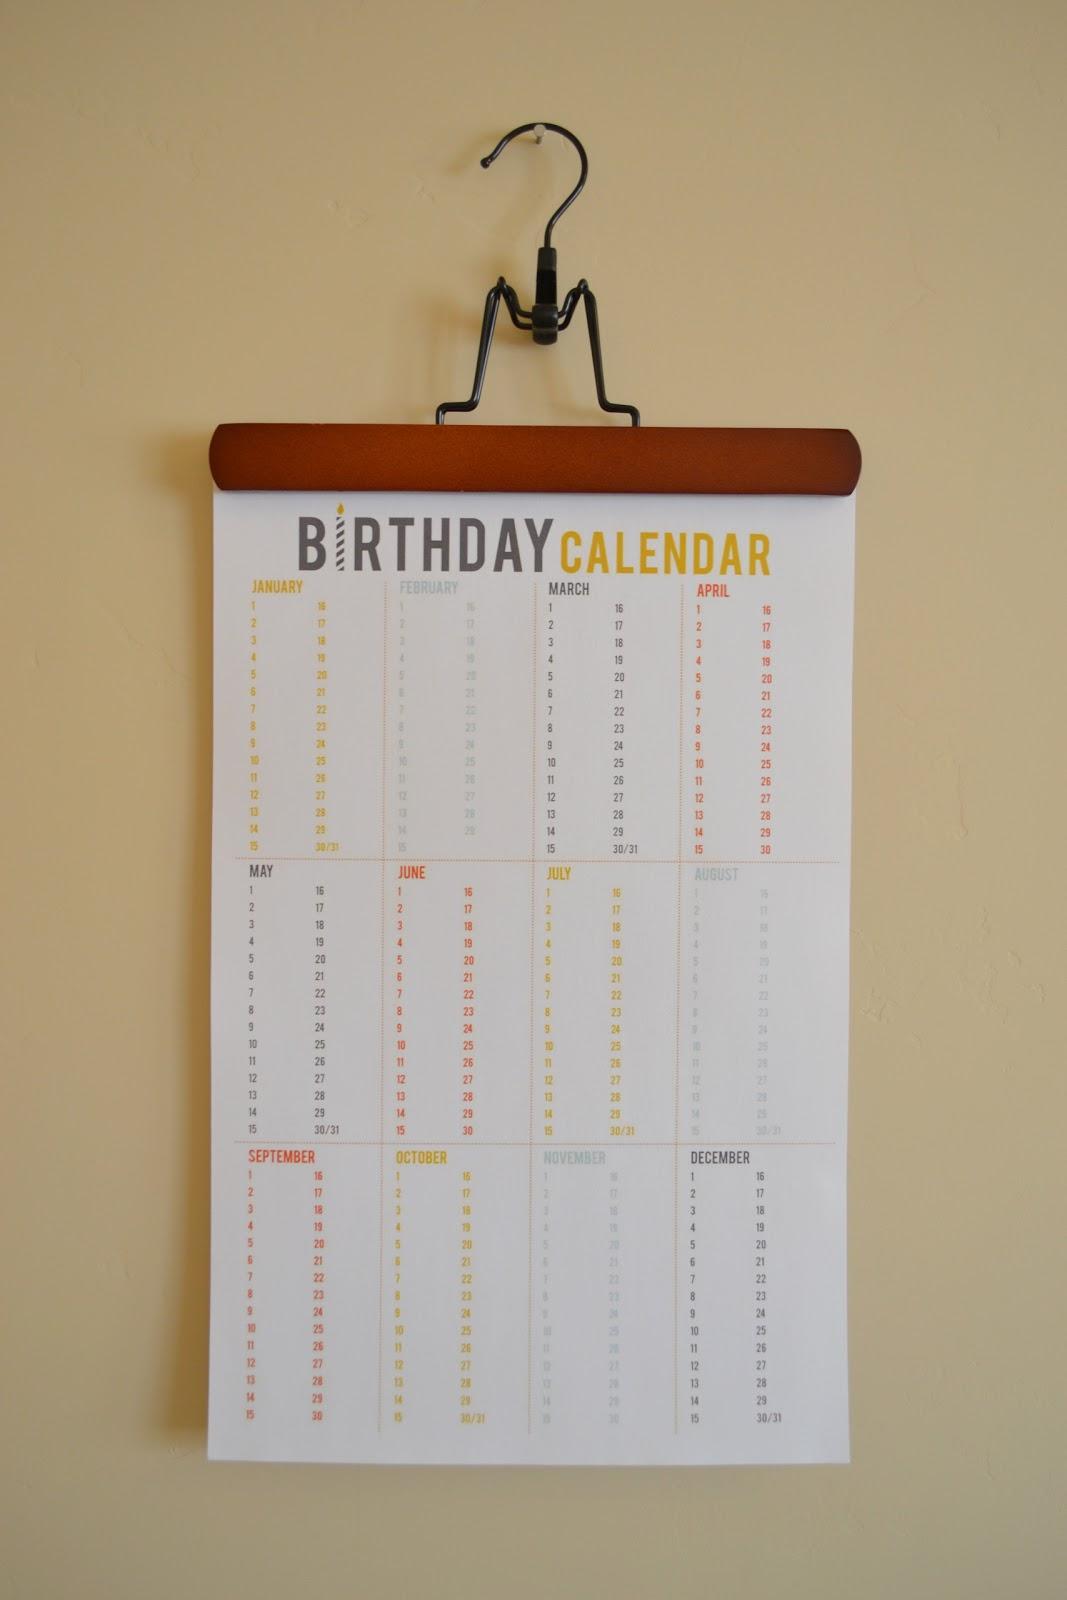 Birthday Calendar Printable : Craftaphile printable birthday calendar